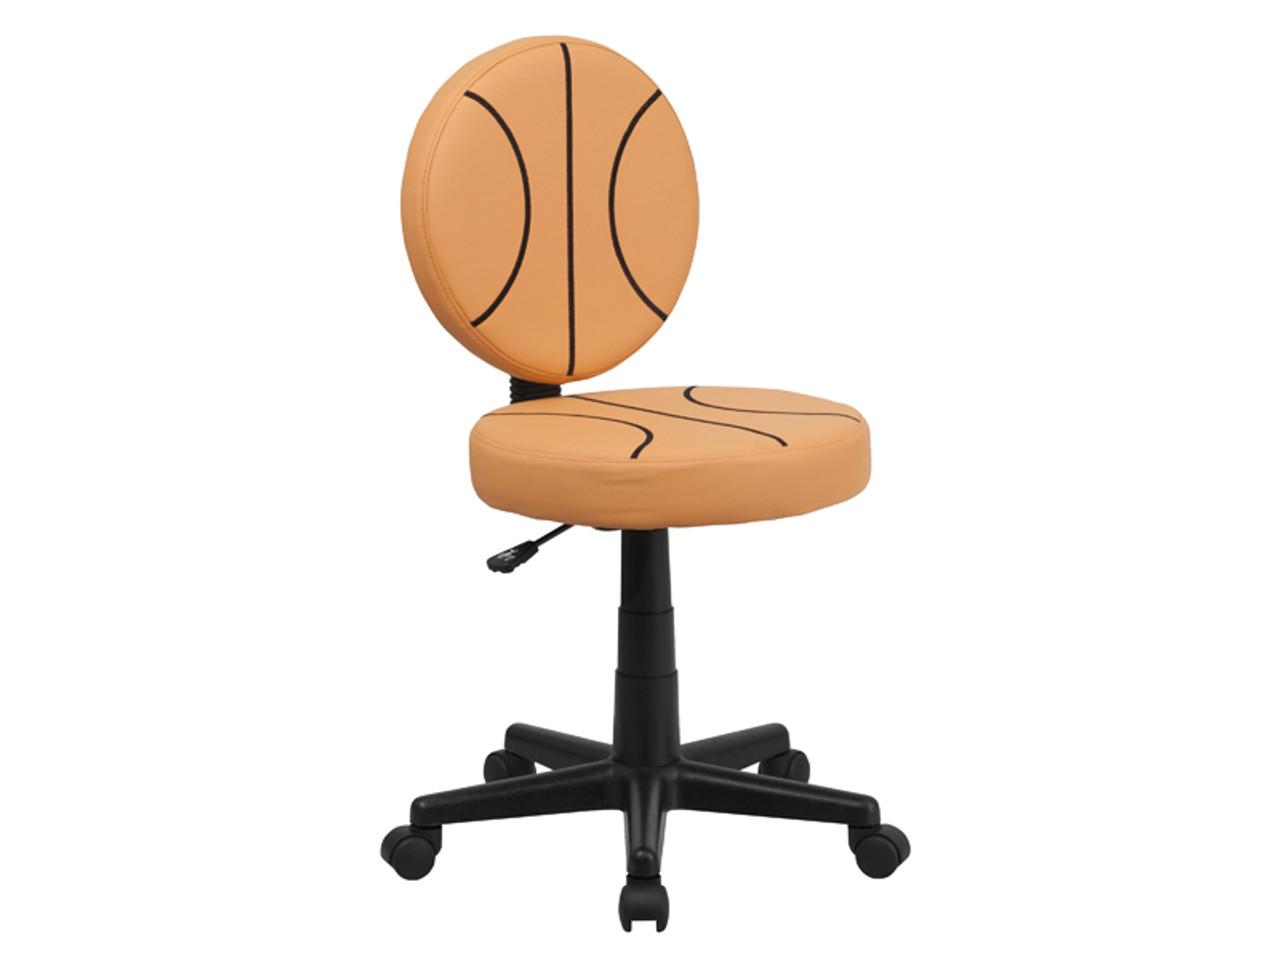 Standard Sports Desk Chairs - Bedroom Source